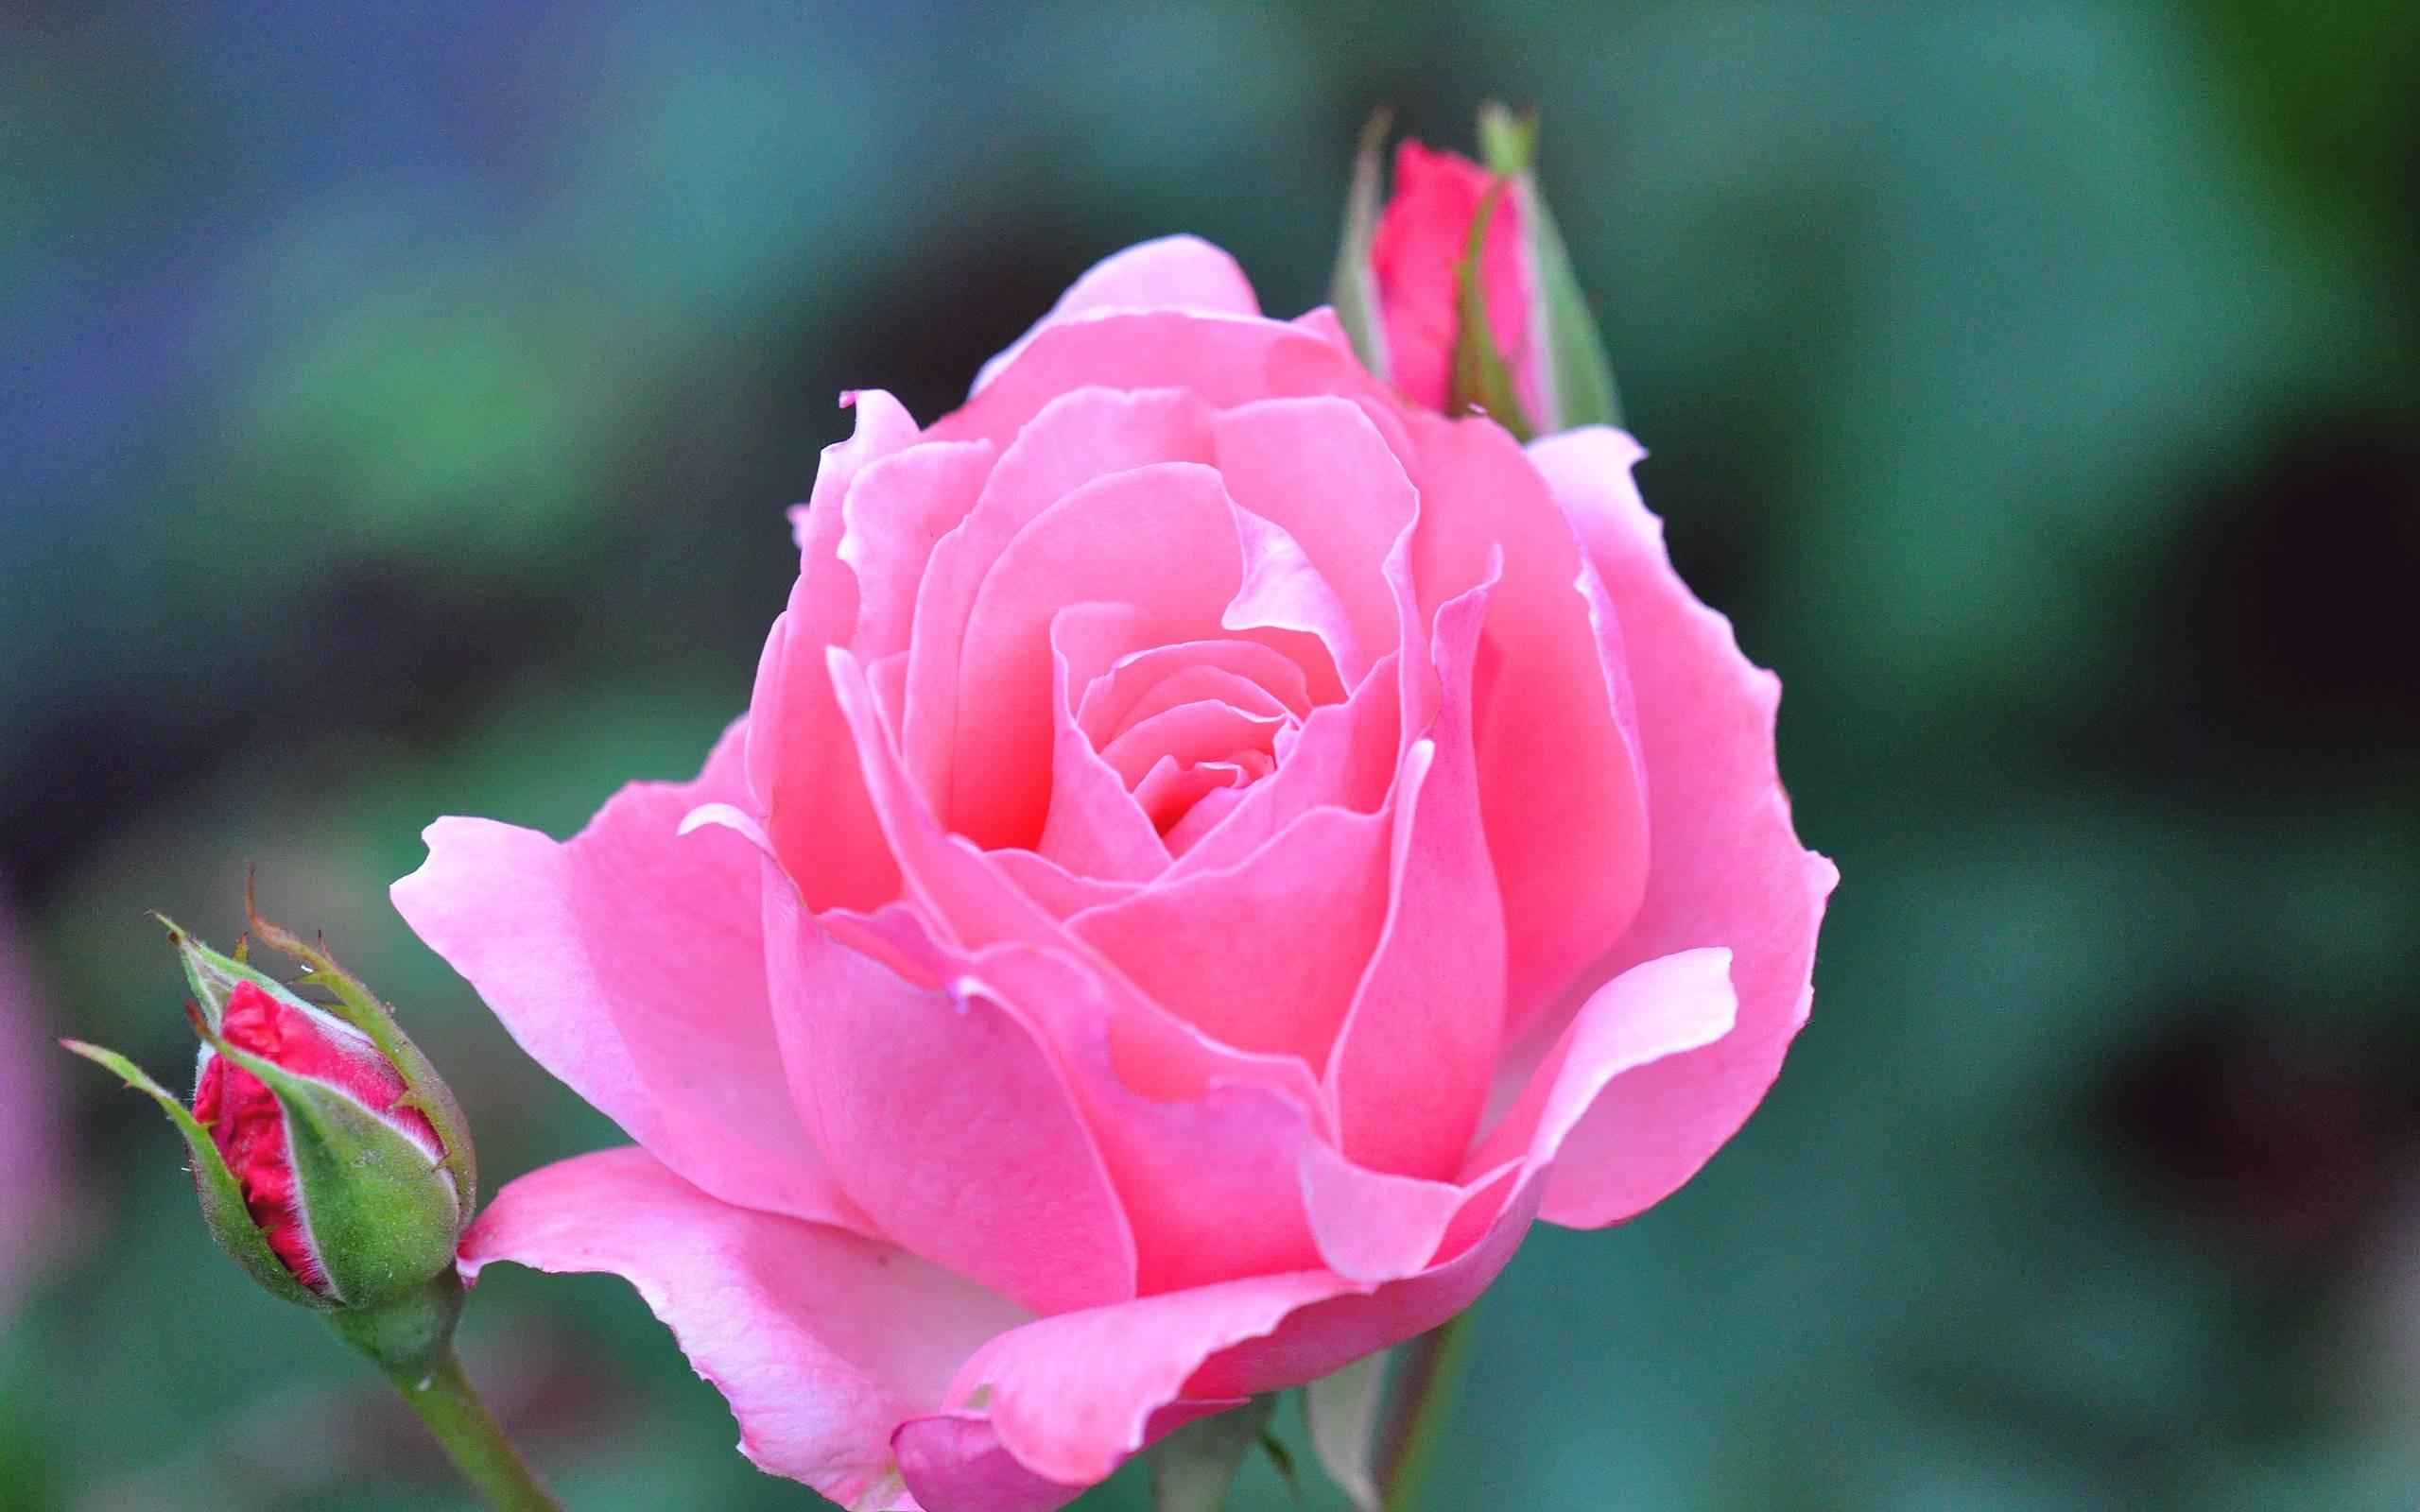 Single Rose Wallpapers: Rose Flower Wallpapers For Desktop (48+ Images